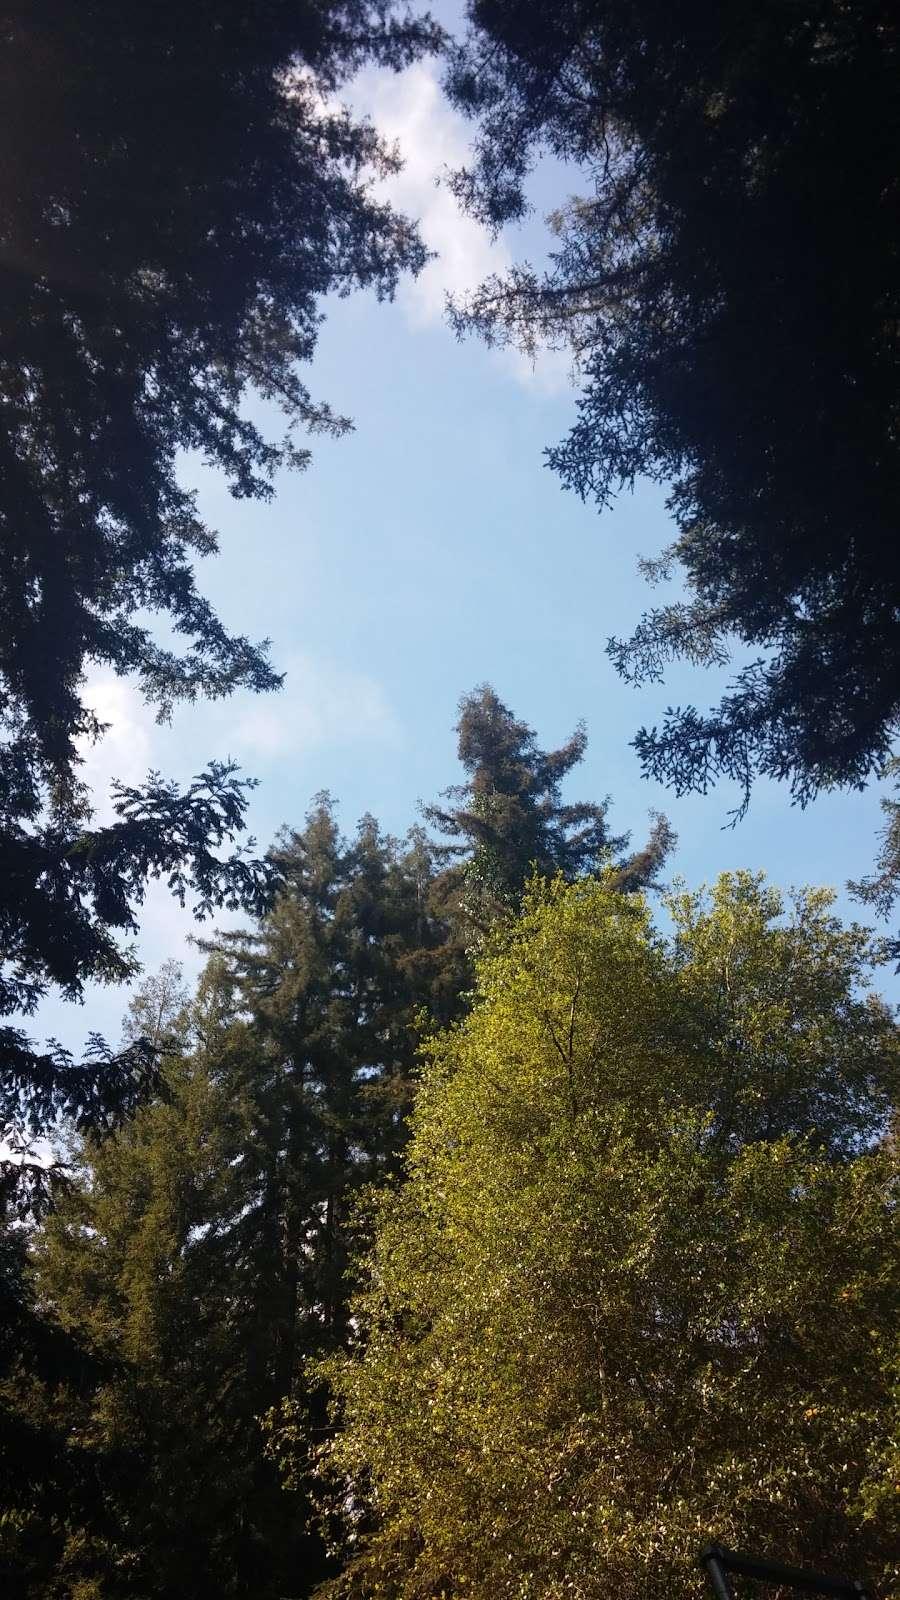 Forest Springs Improvement & Maintenance - park  | Photo 2 of 5 | Address: 401 Acorn Dr, Boulder Creek, CA 95006, USA | Phone: (831) 338-7134